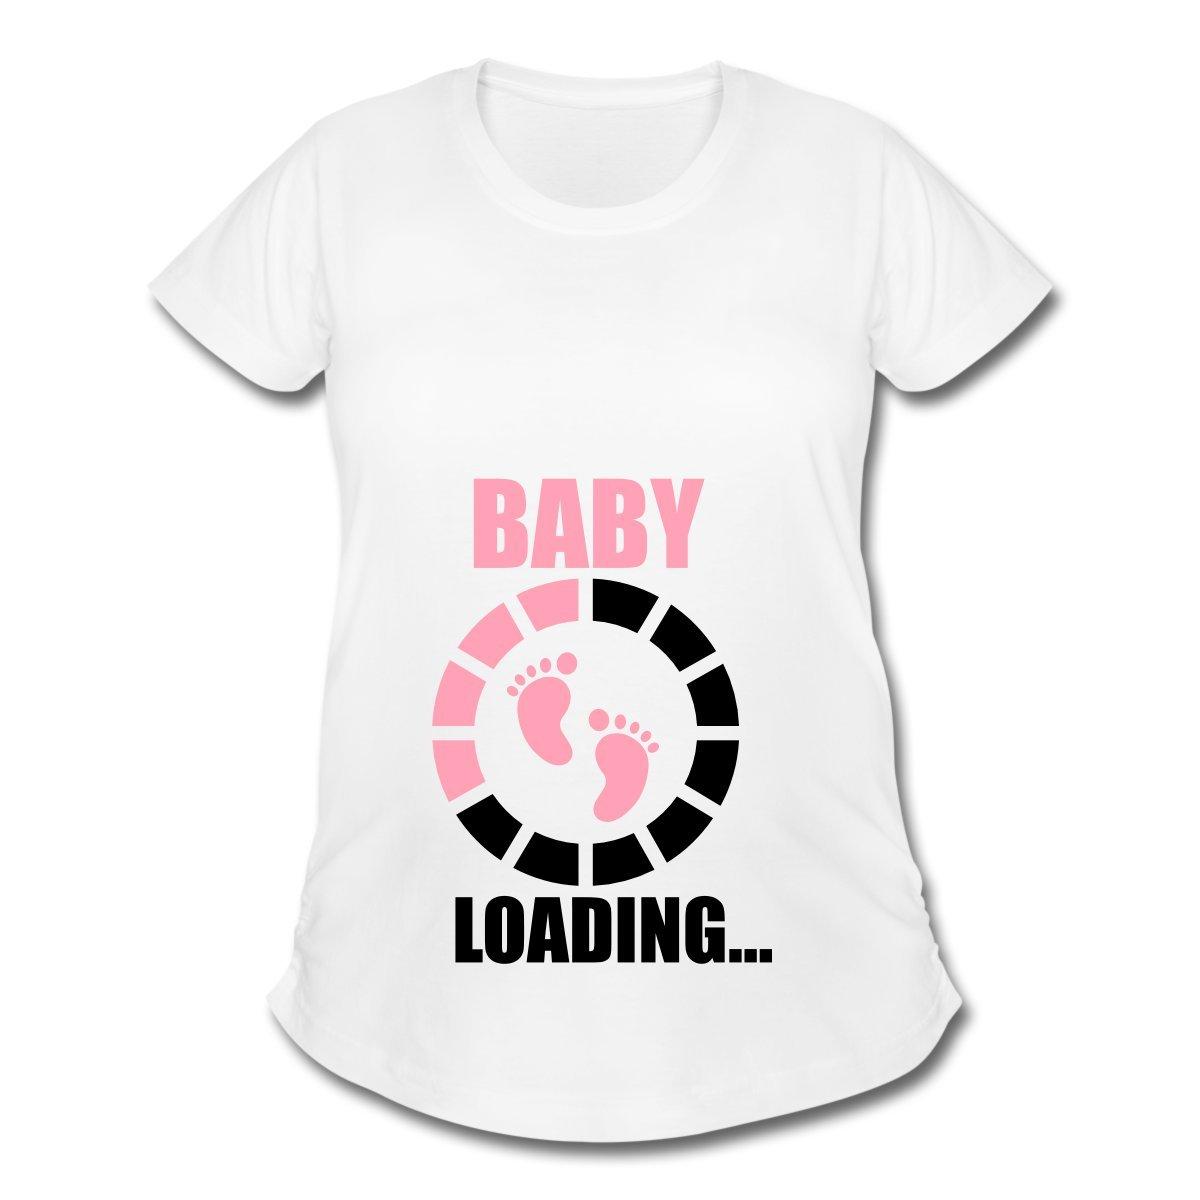 4af50650b4f86 Spreadshirt Pregnancy Baby Loading Footprints Women's Maternity T-Shirt